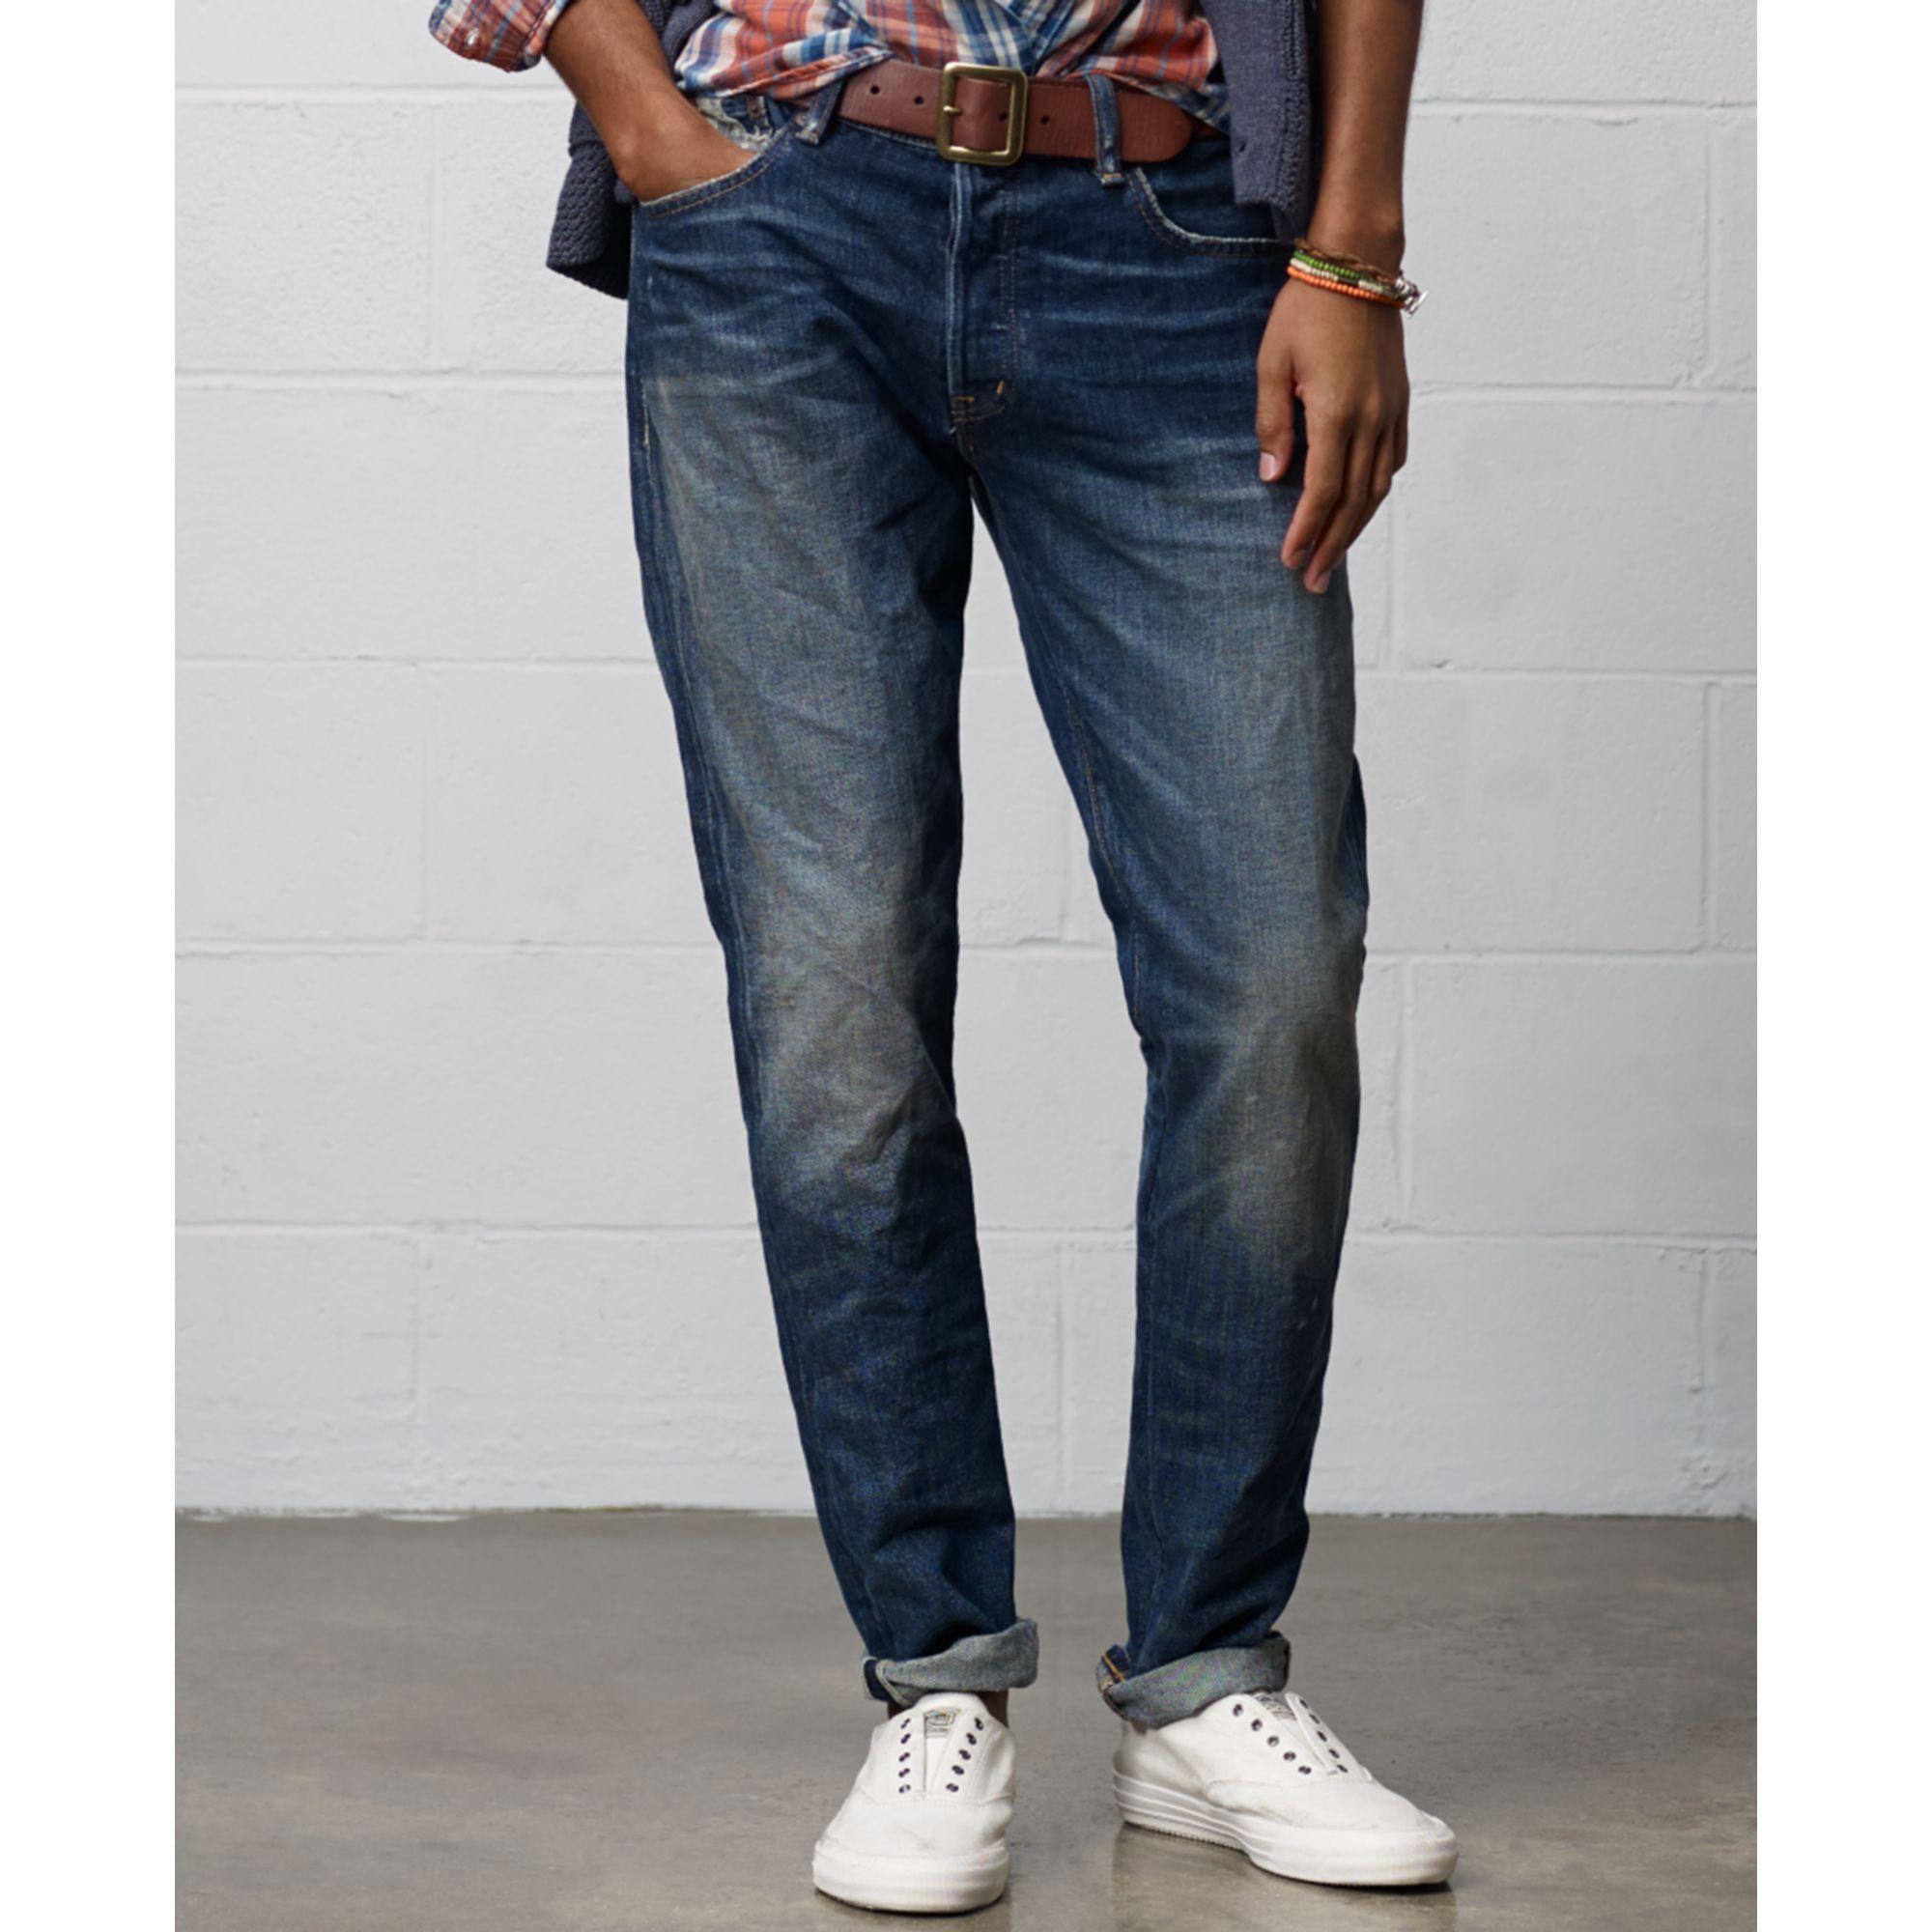 denim supply ralph lauren renton tapered straight fit jeans in blue for men renton lyst. Black Bedroom Furniture Sets. Home Design Ideas